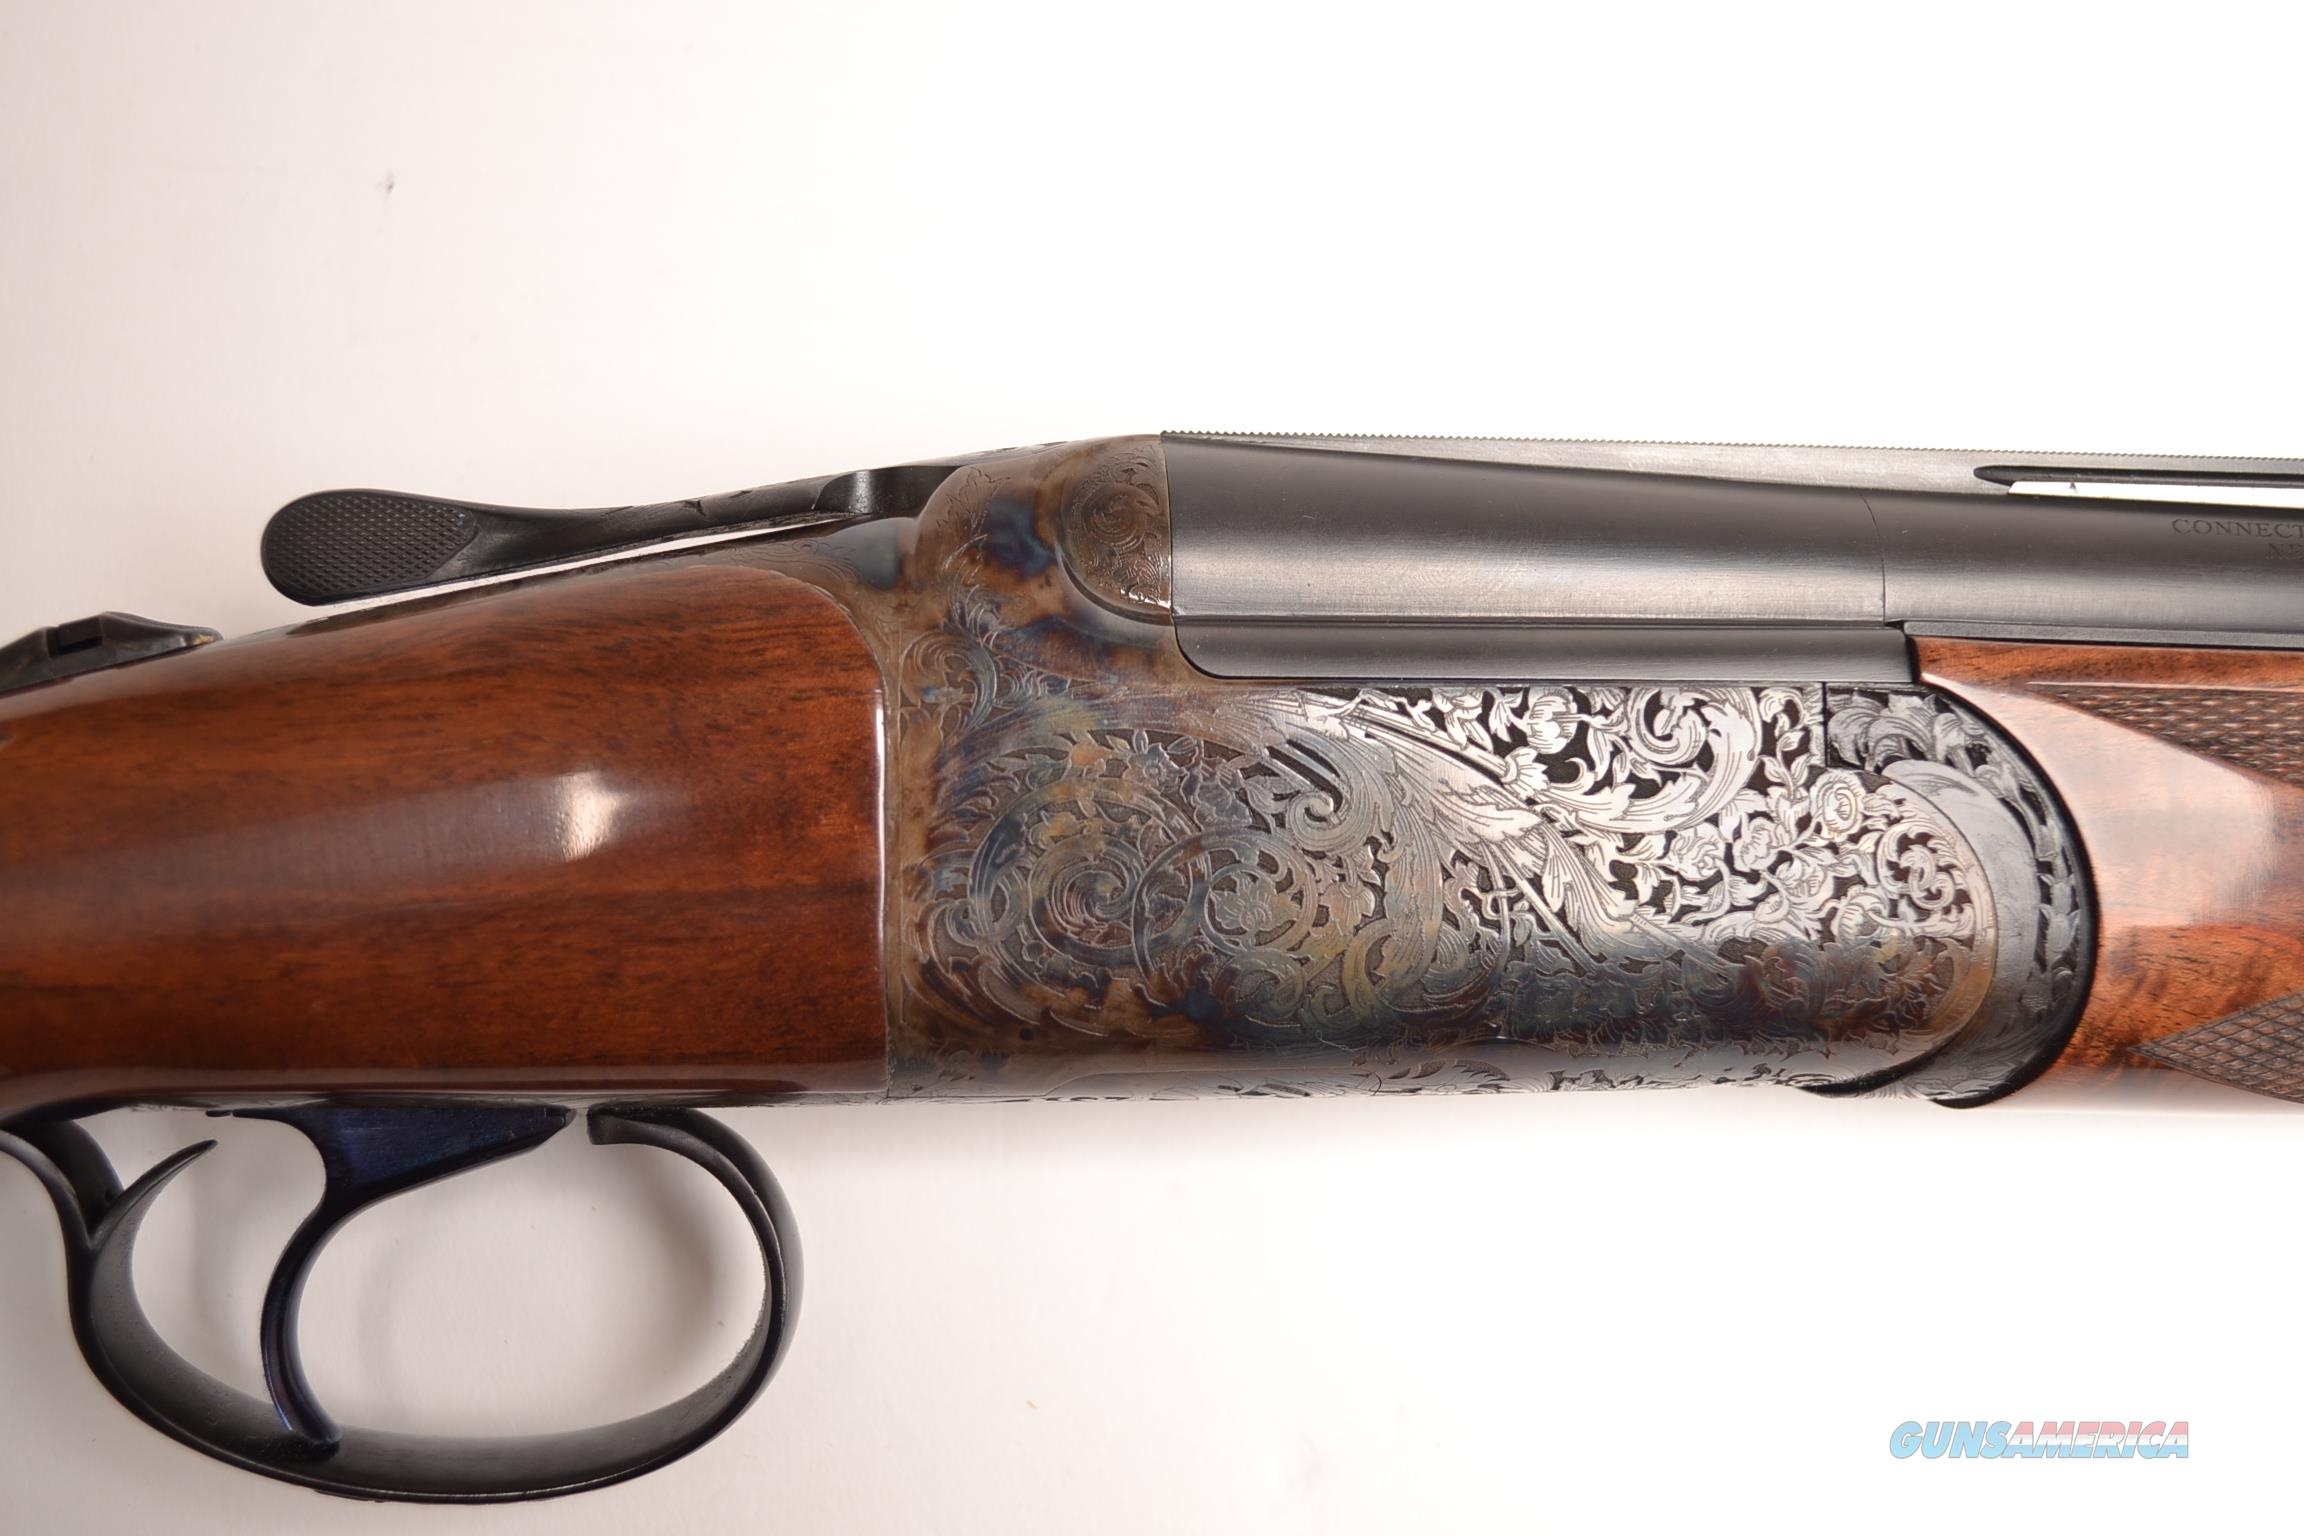 CSMC - Inverness  Guns > Shotguns > Connecticut (Galazan) Shotguns